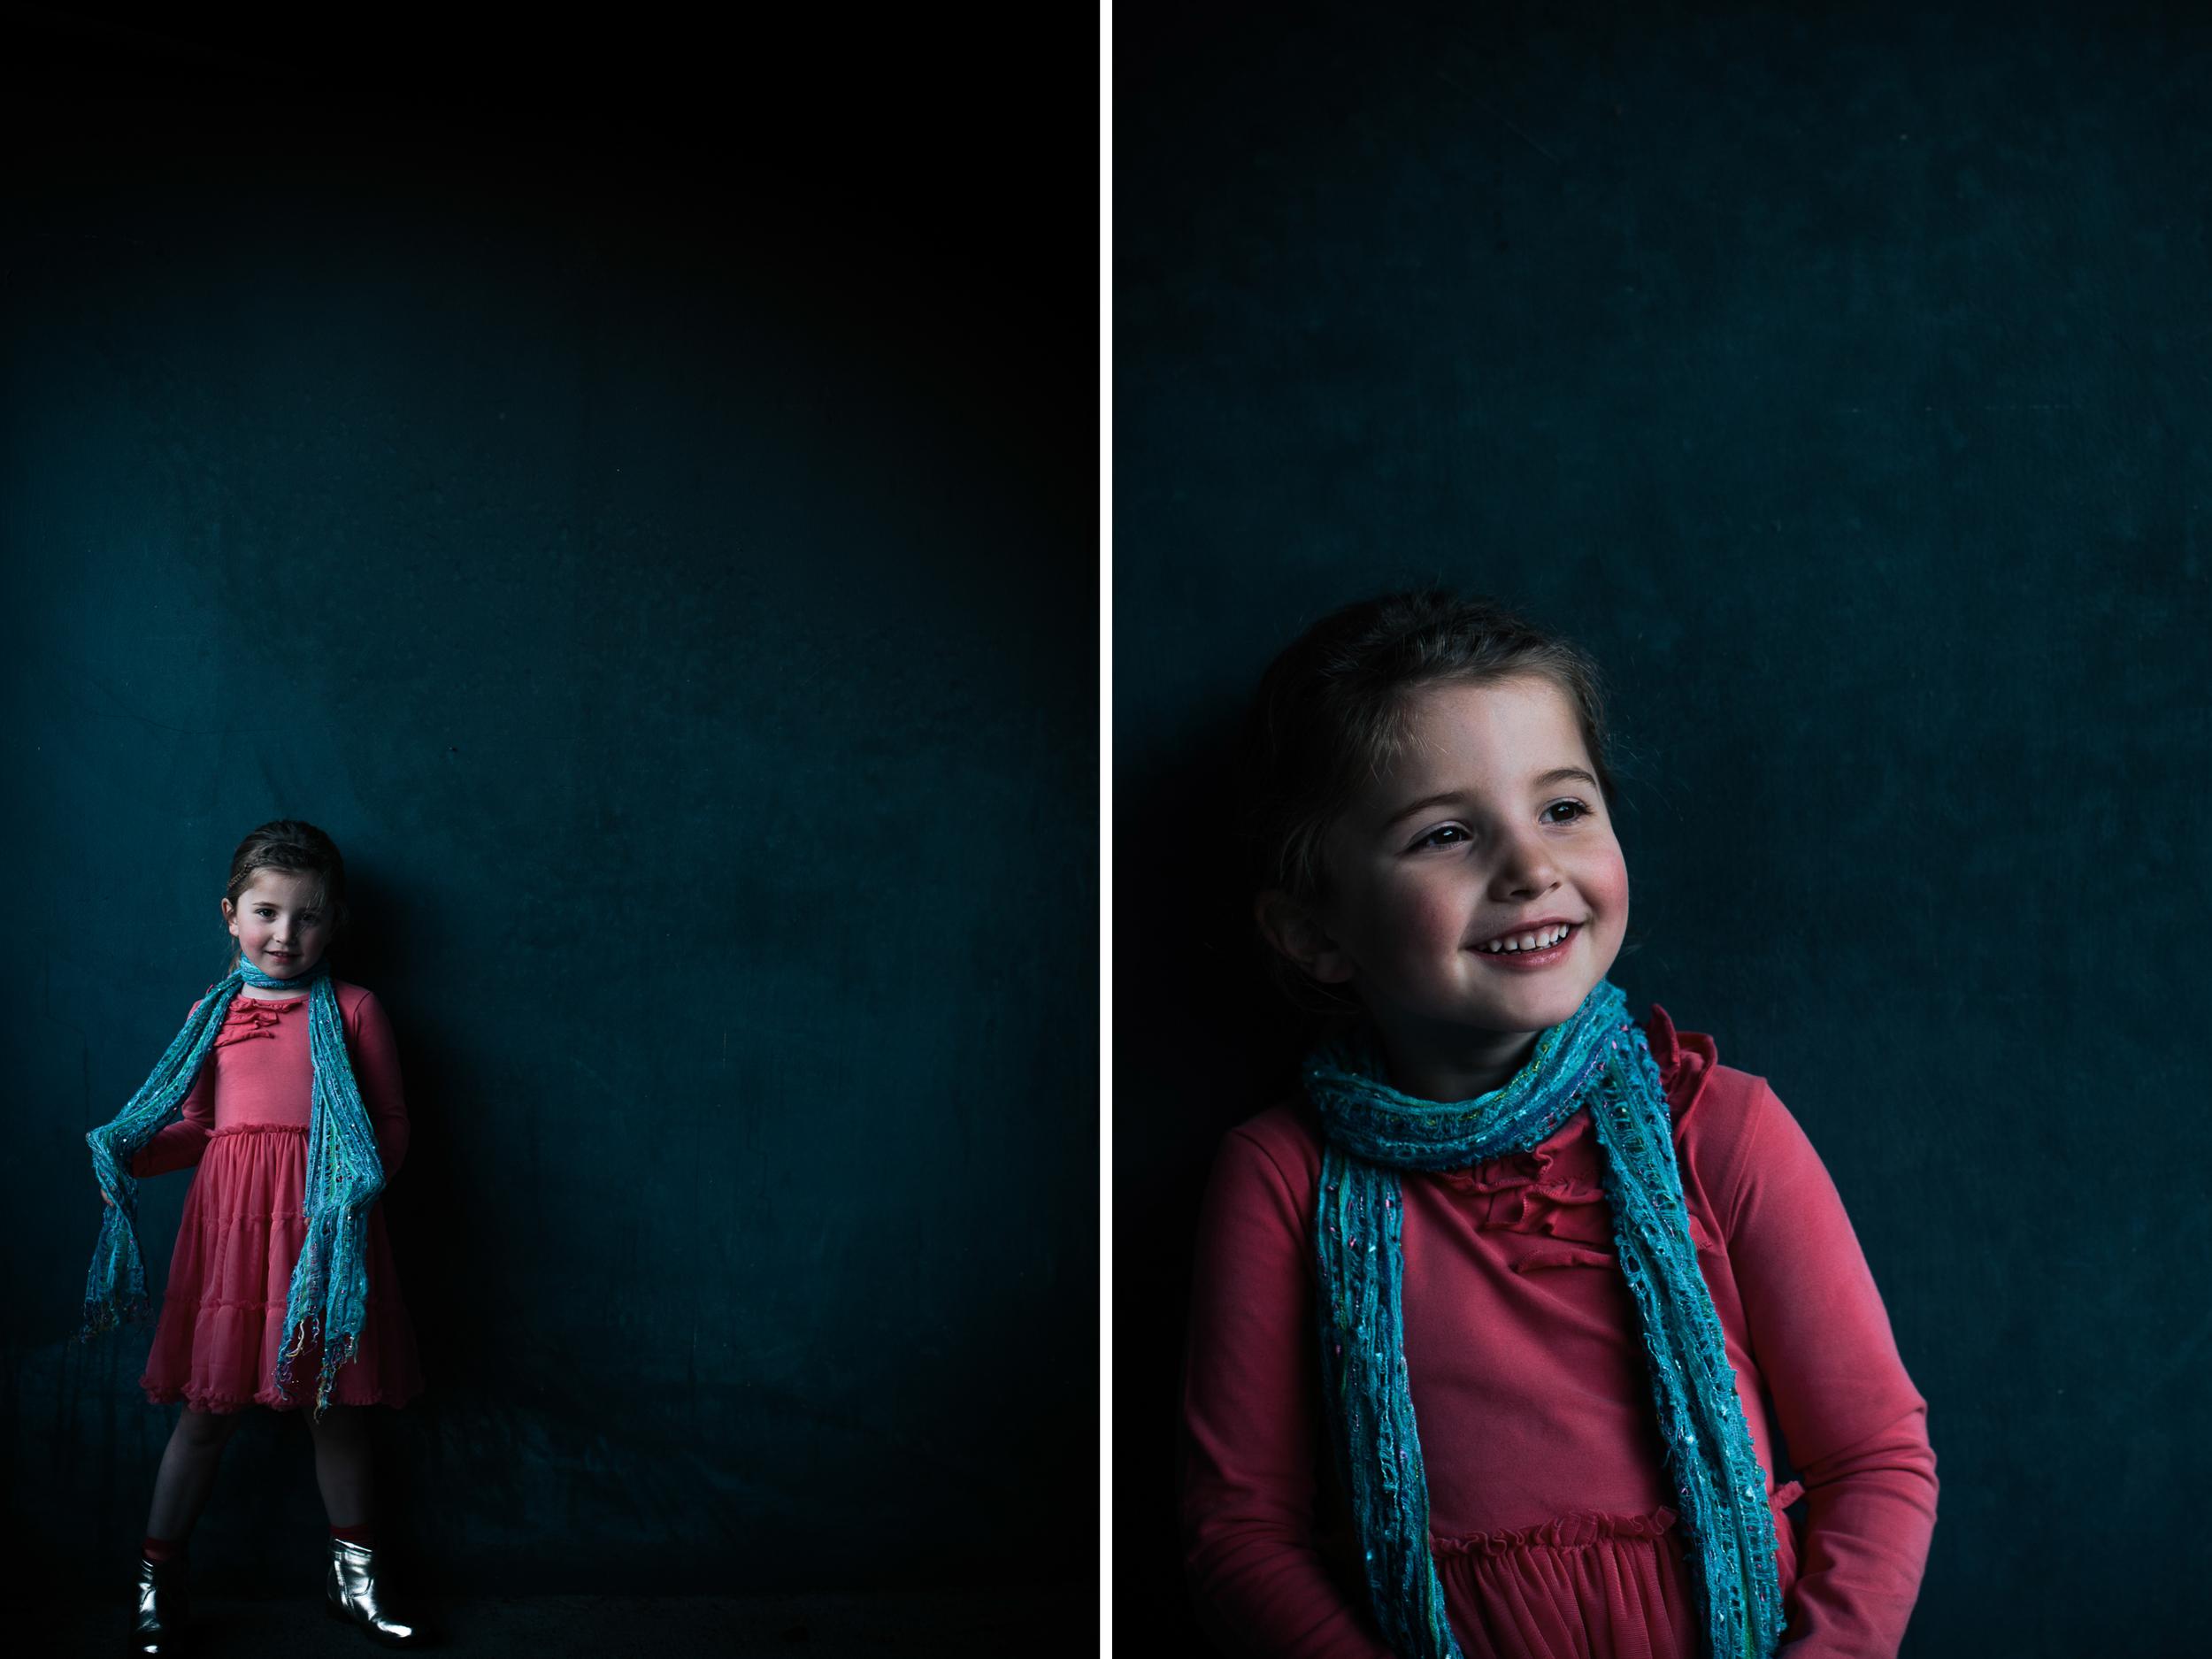 sheridan_nilsson_child_portrait_photographer.025.jpeg